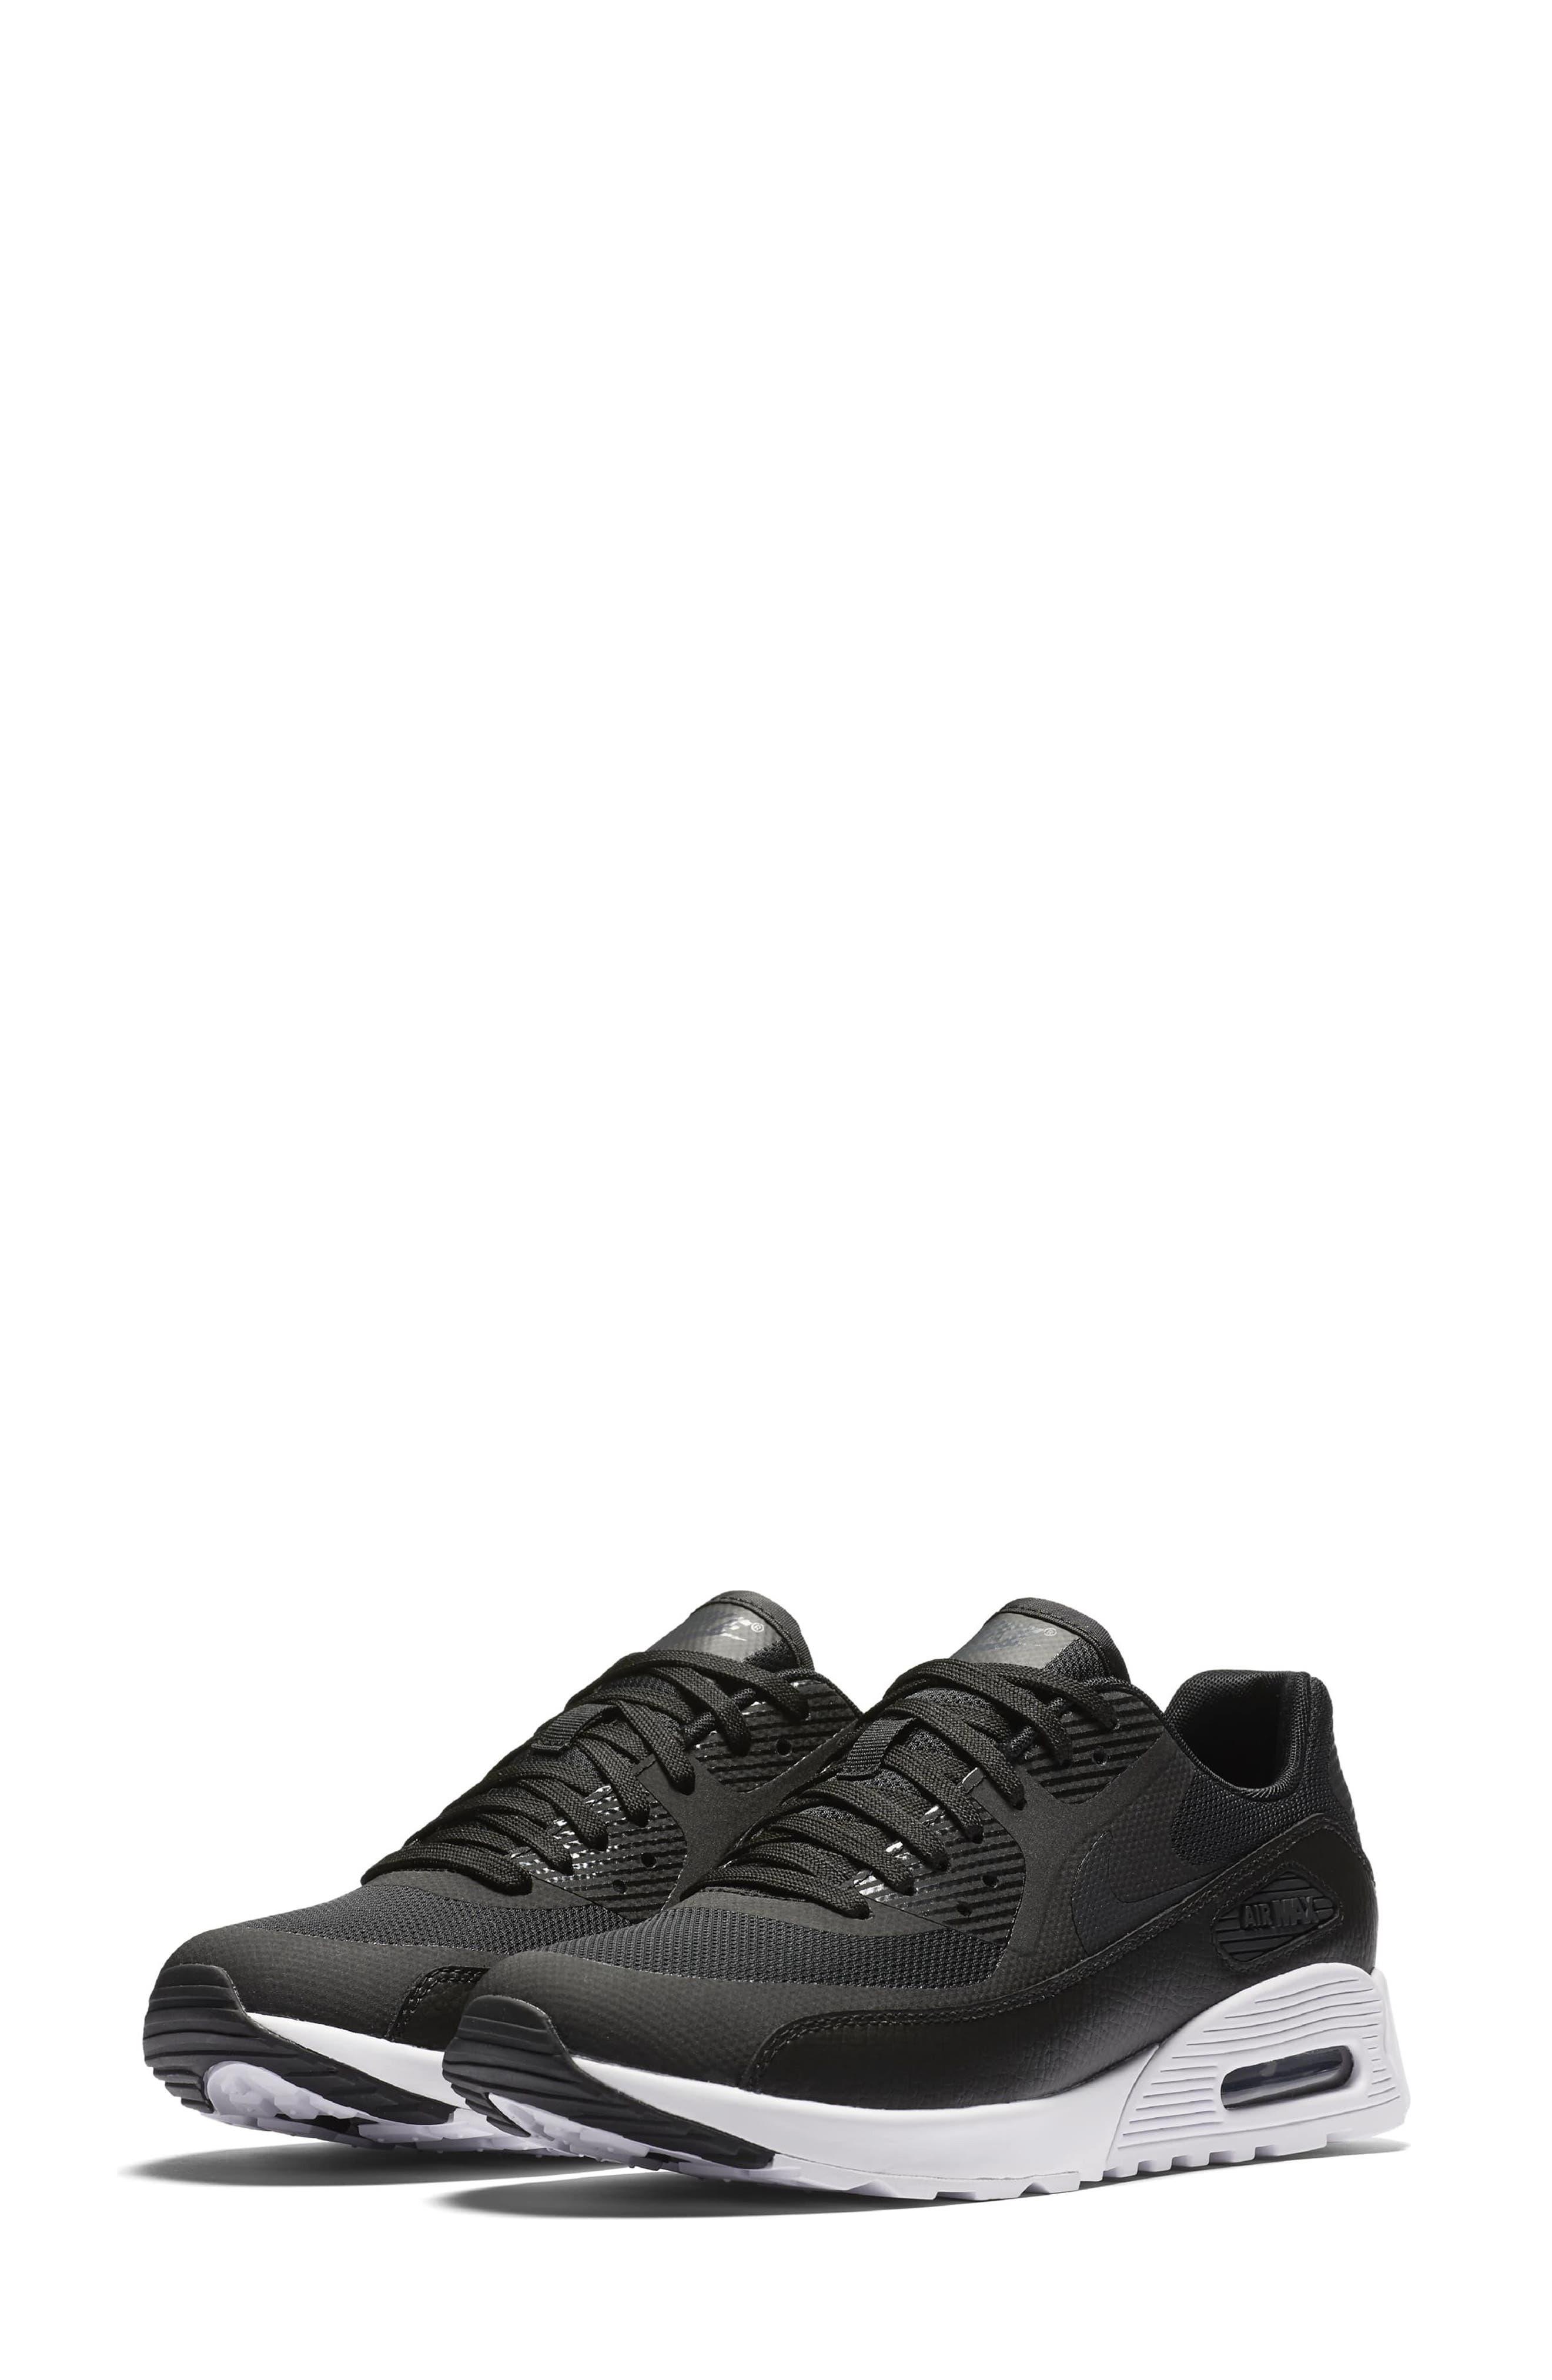 Air Max 90 Ultra 2.0 Sneaker,                             Main thumbnail 1, color,                             002